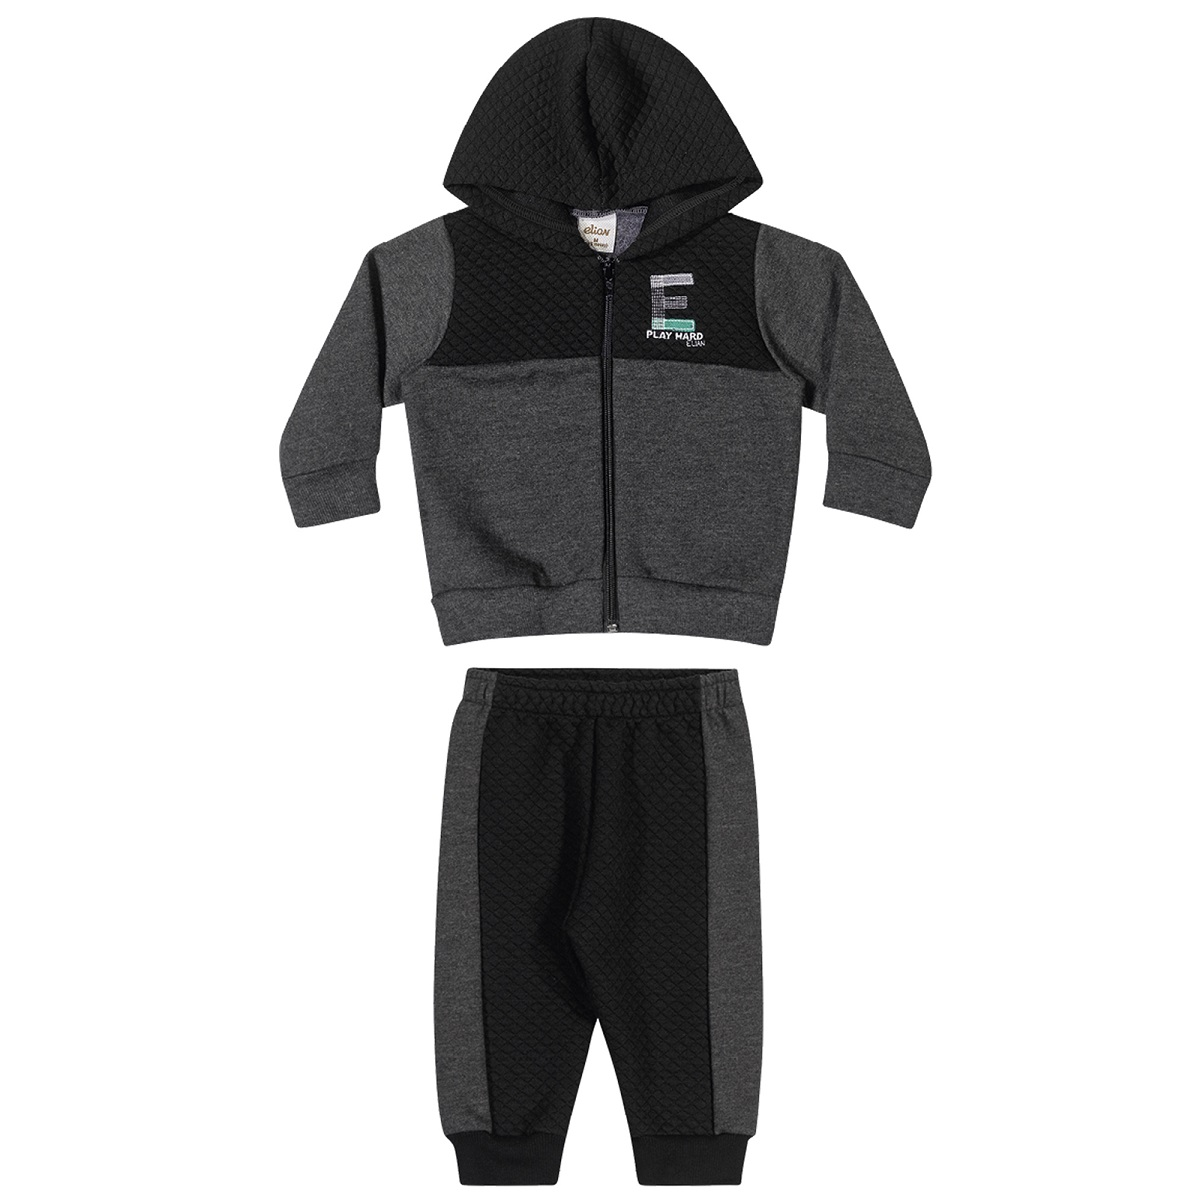 Conjunto Infantil Masculino Jaqueta e Calça - ELIAN 20931